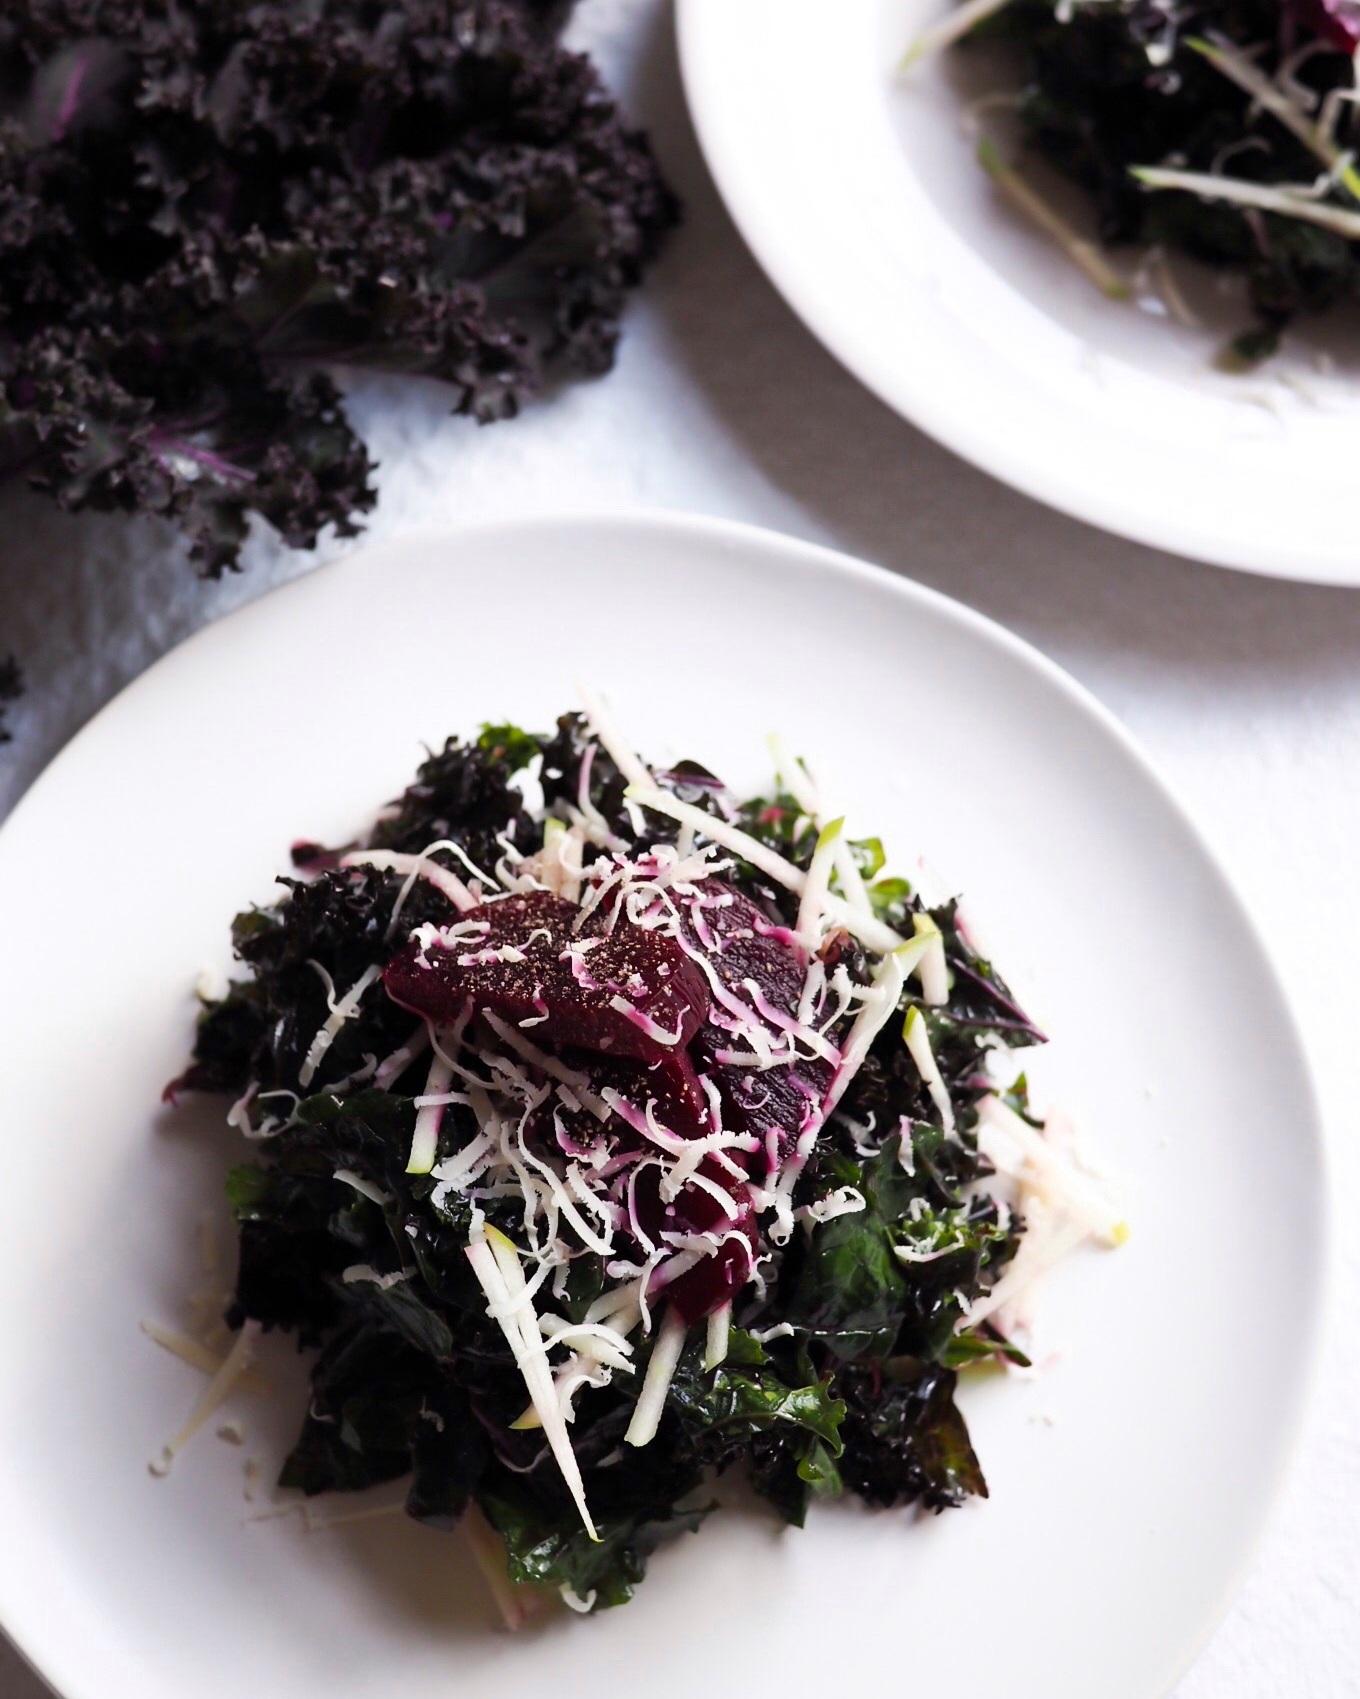 Purple+Kale+Salad+with+Beet+Vinaigrette+-+Kris+Gill